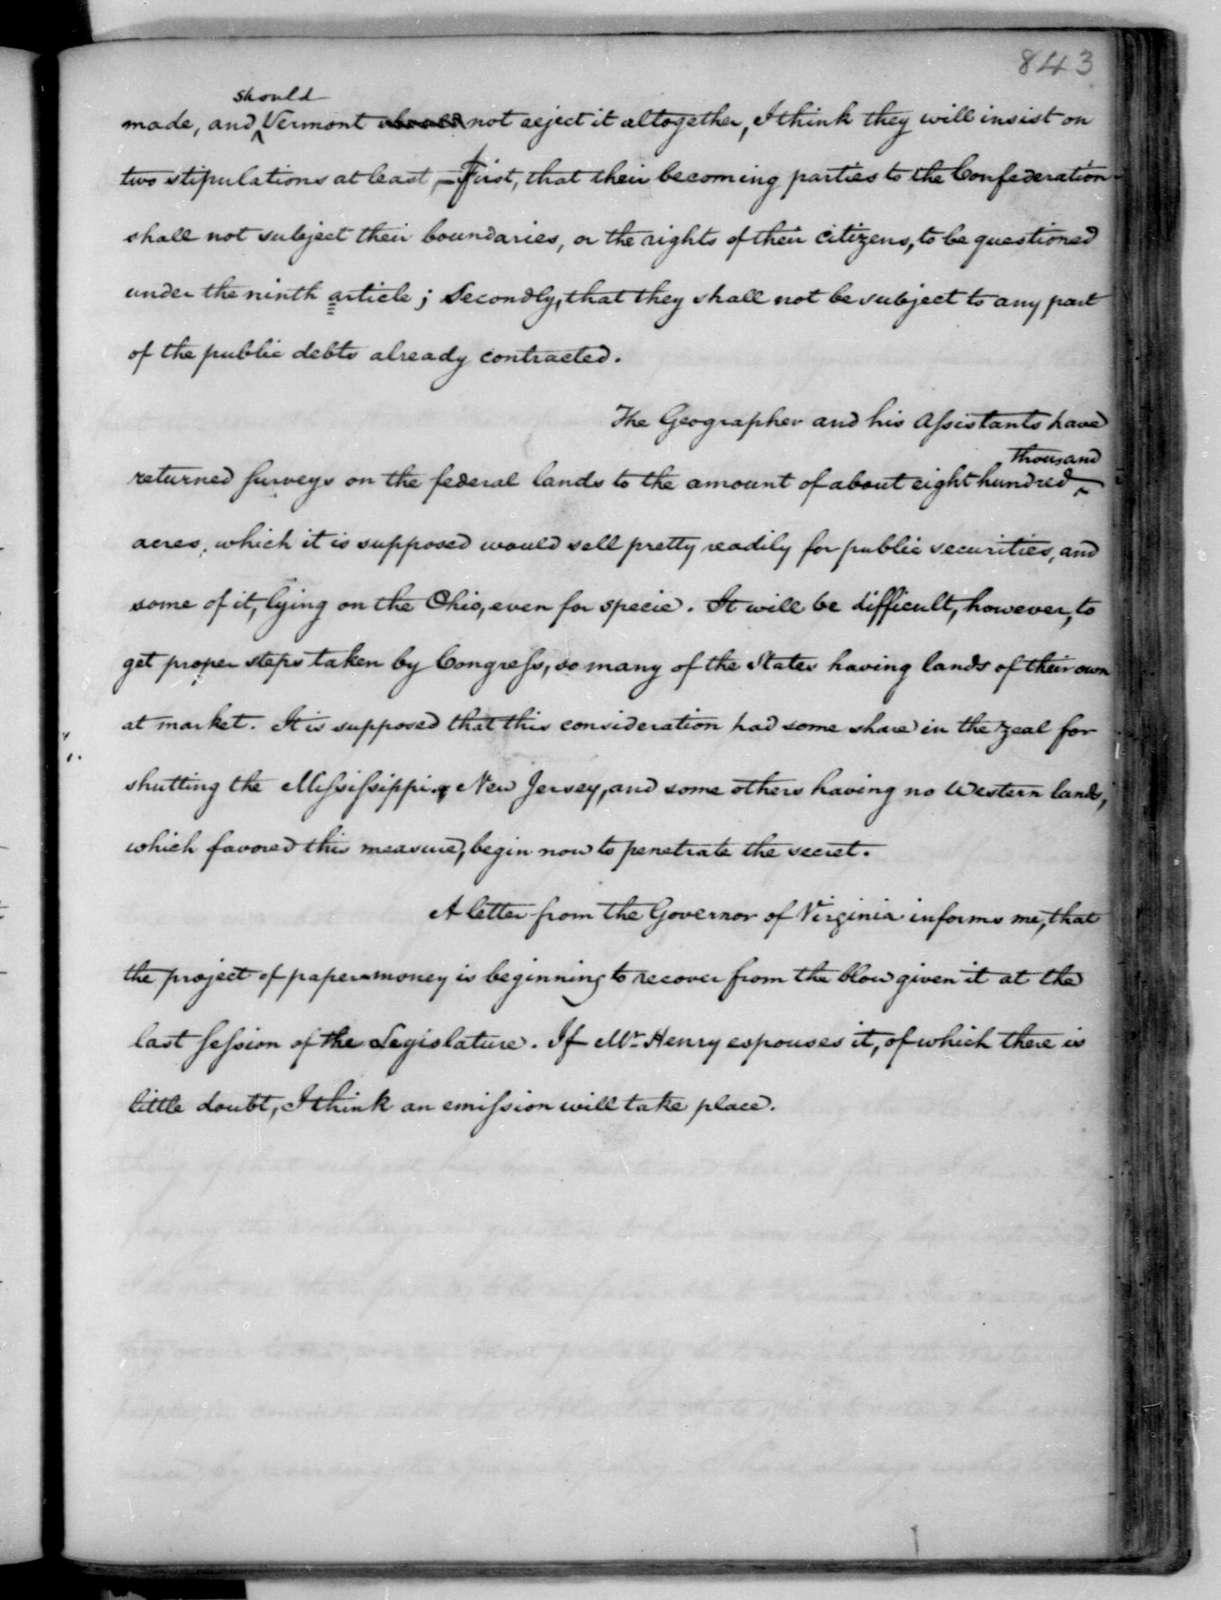 James Madison to Thomas Jefferson, March 19, 1787.